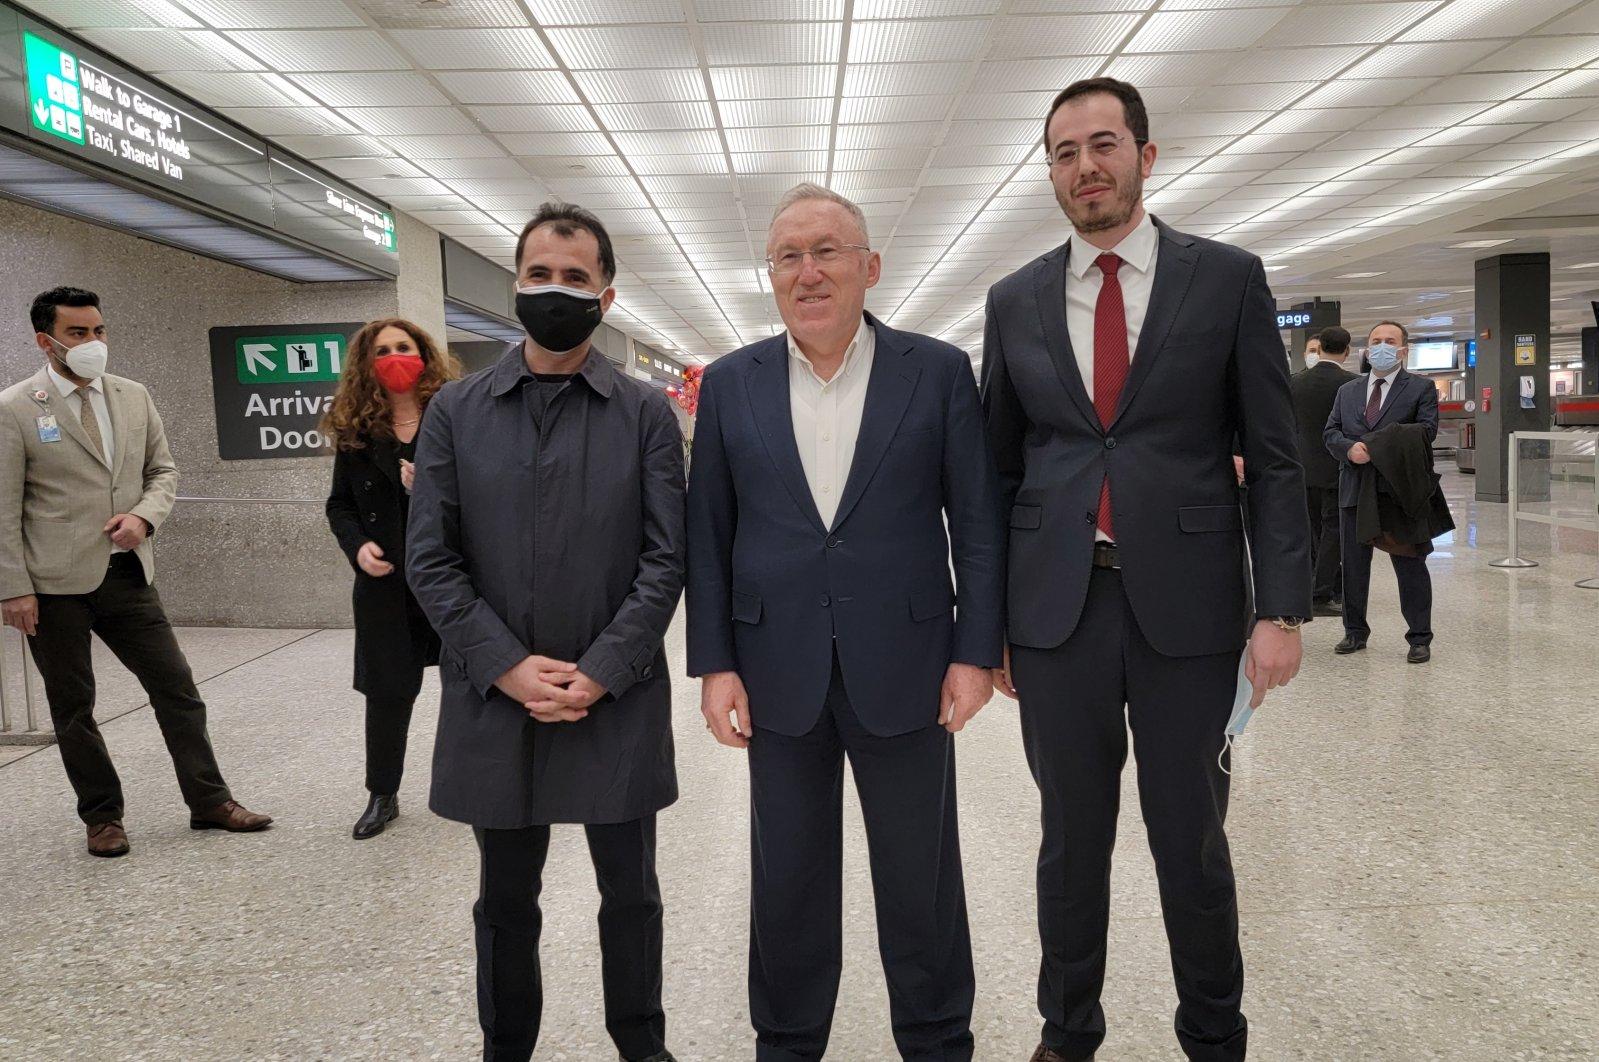 Embassy workers and the Turkish community greet  Turkey's new U.S. Ambassador Hasan Murat Mercan in Dallas airport, March 15, 2021. (AA Photo)